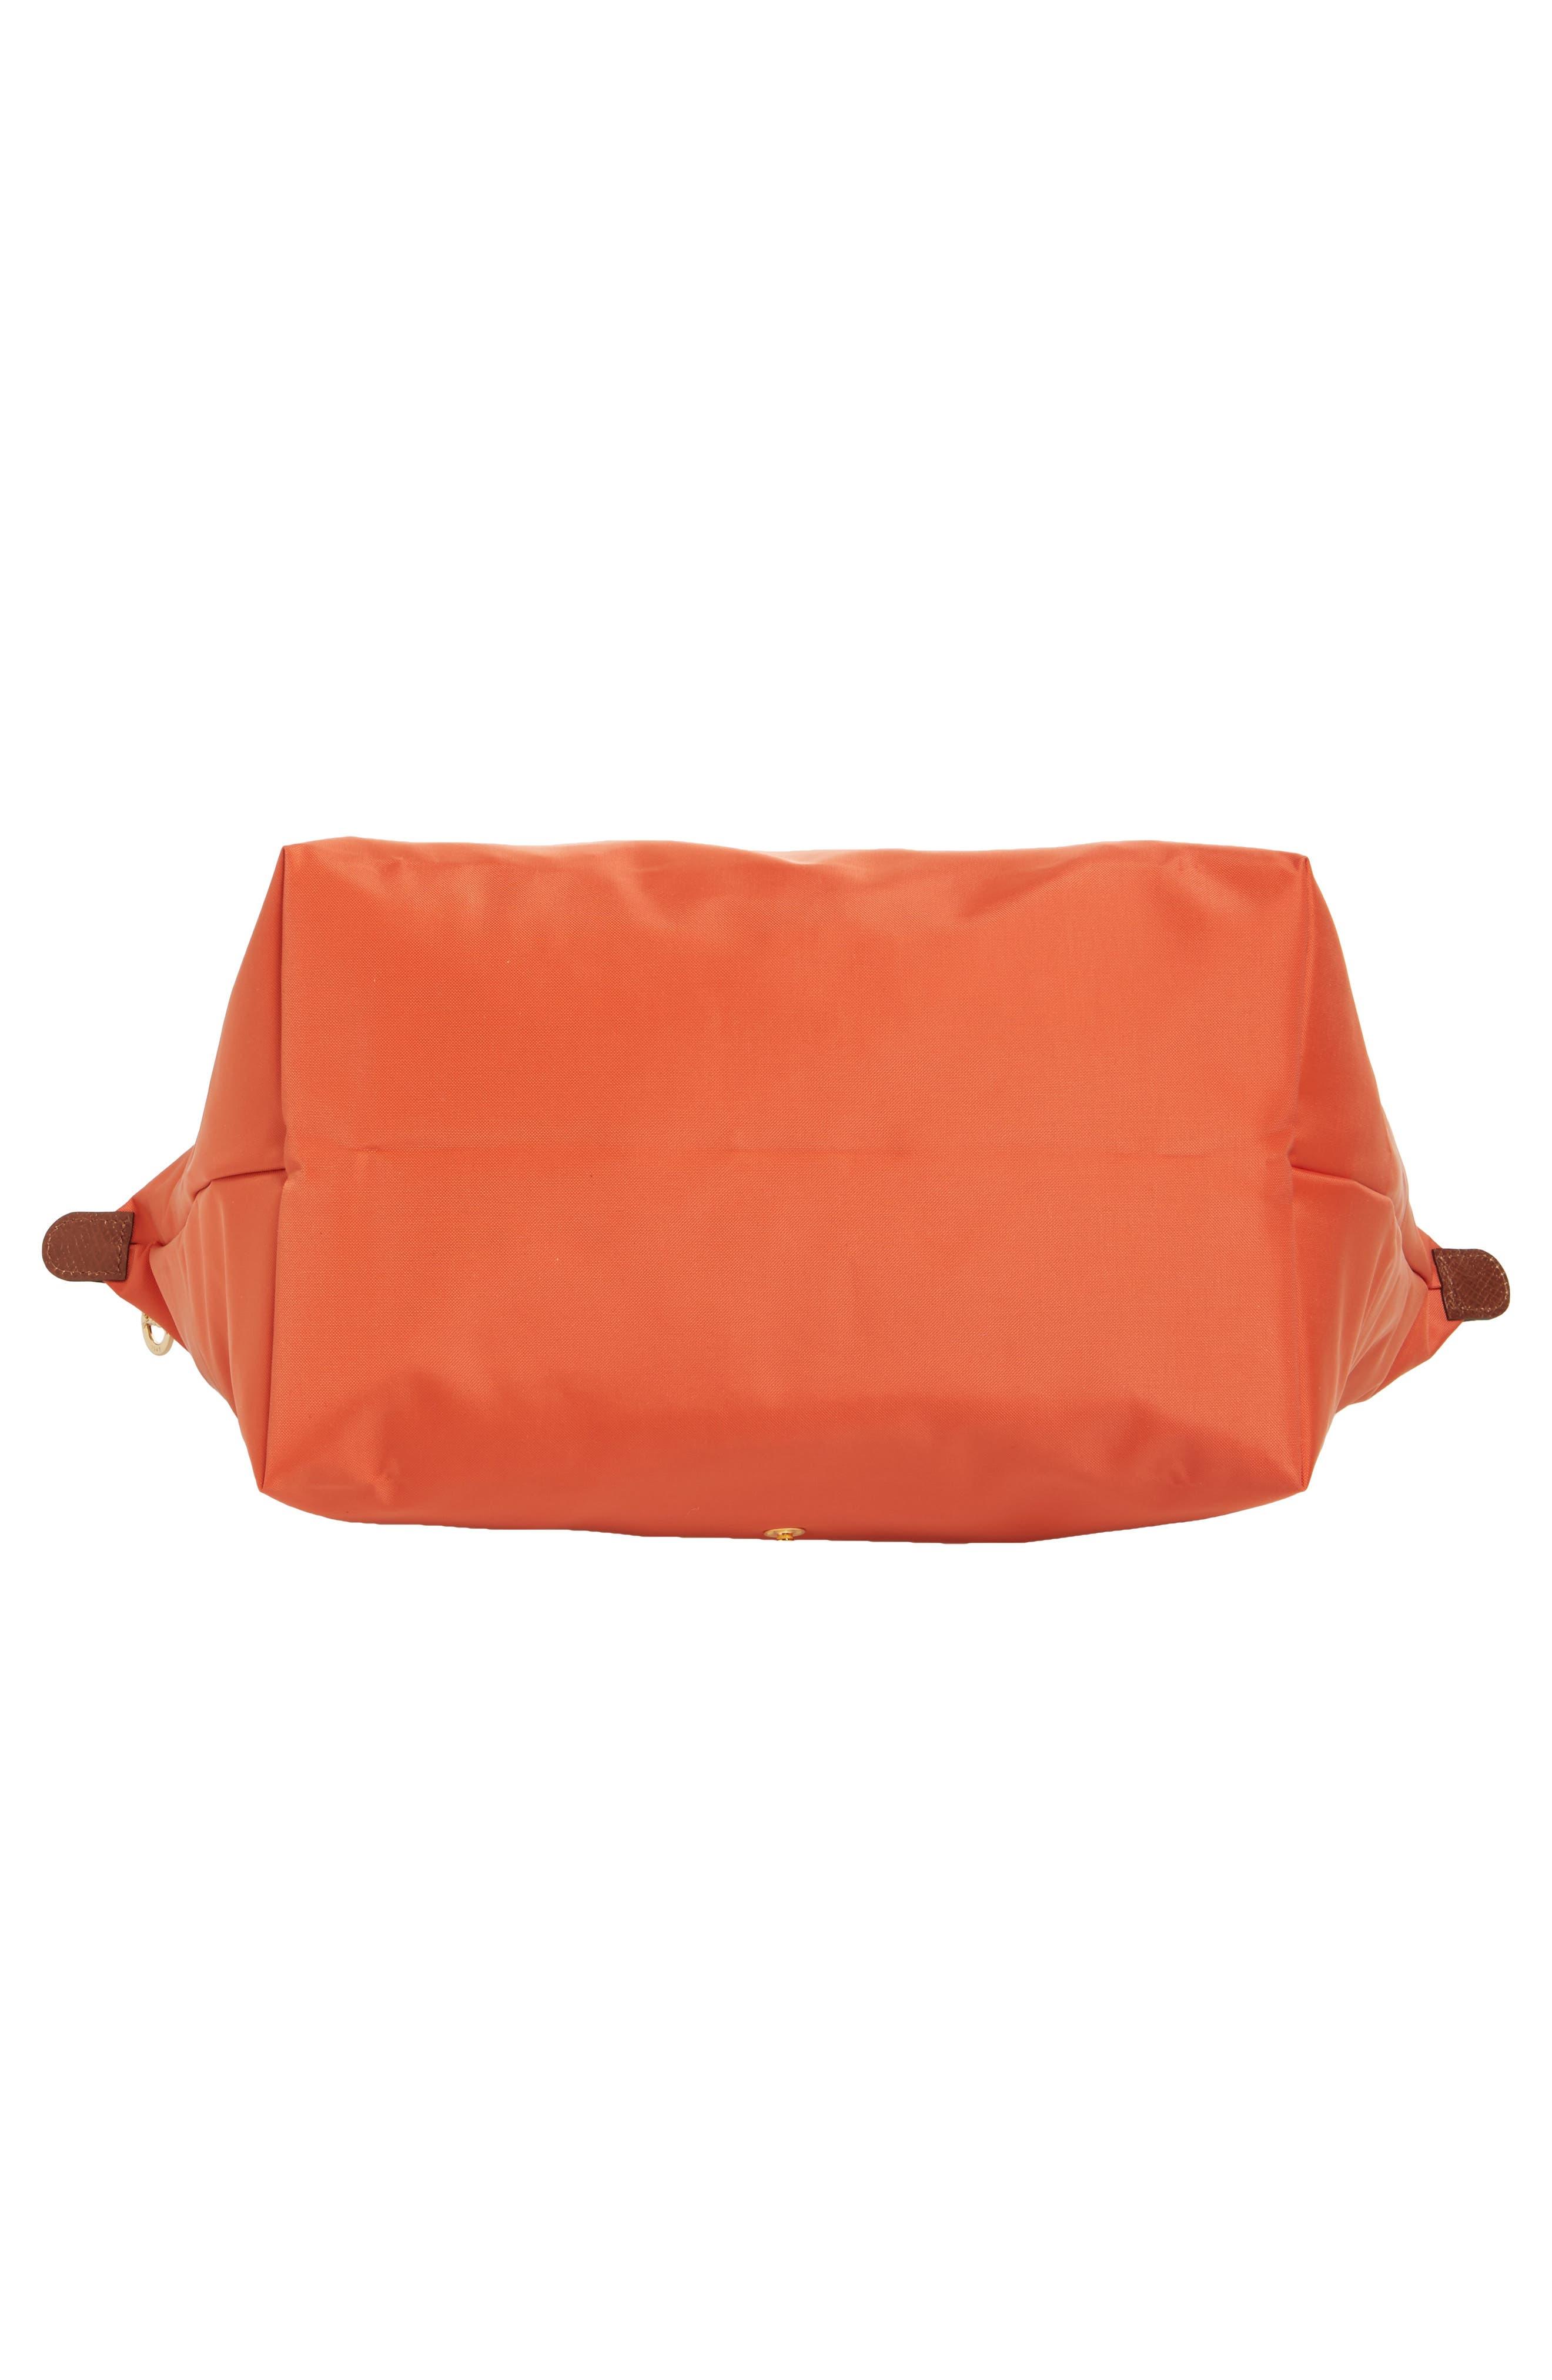 'Large Le Pliage' Tote,                             Alternate thumbnail 6, color,                             Orange